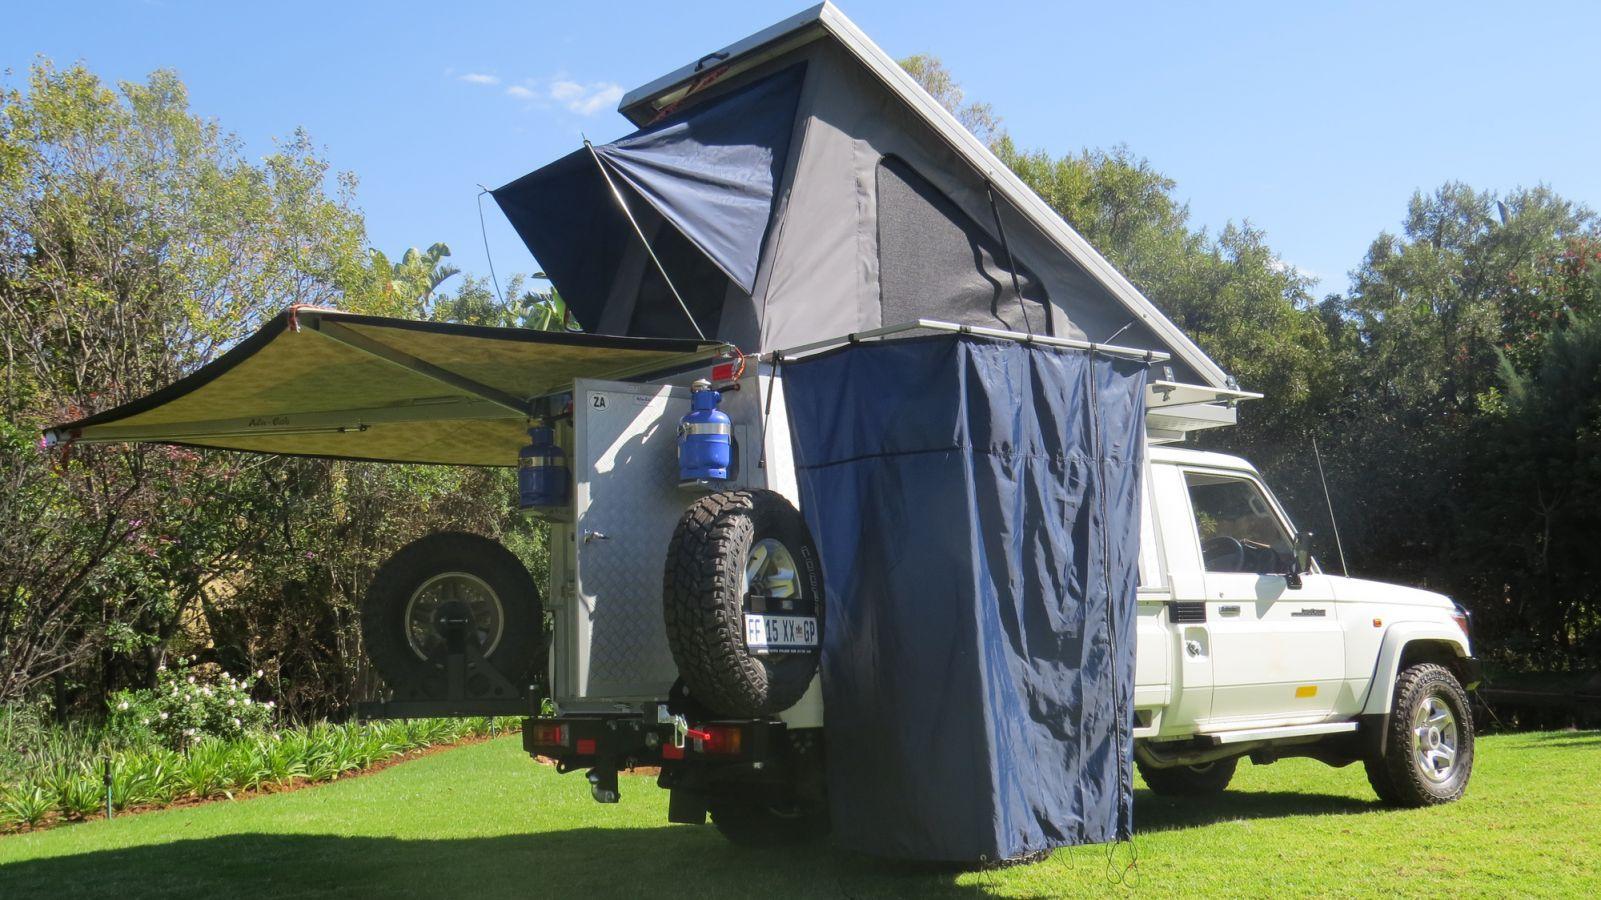 Toyota Landcruiser Bush Camper met douche